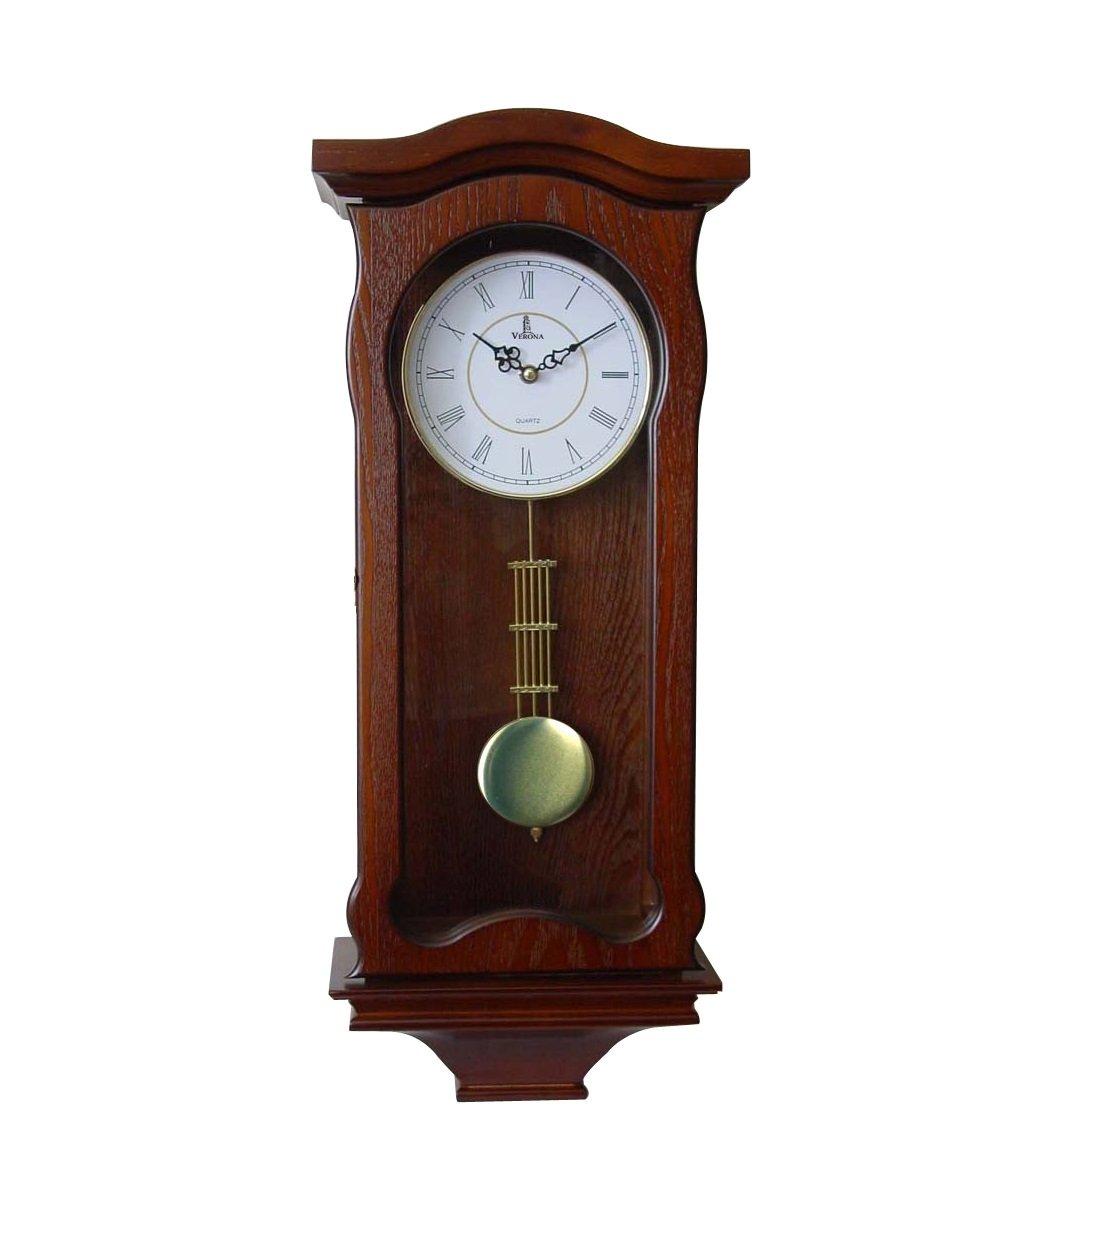 Pendulum Wall Clock Battery Operated - Silent Quartz Wood Pendulum Clock - Dark Wooden Decorative Wall Clock Pendulum, for Living Room, Kitchen & Home Décor, 12.5 x 9.75 Inches